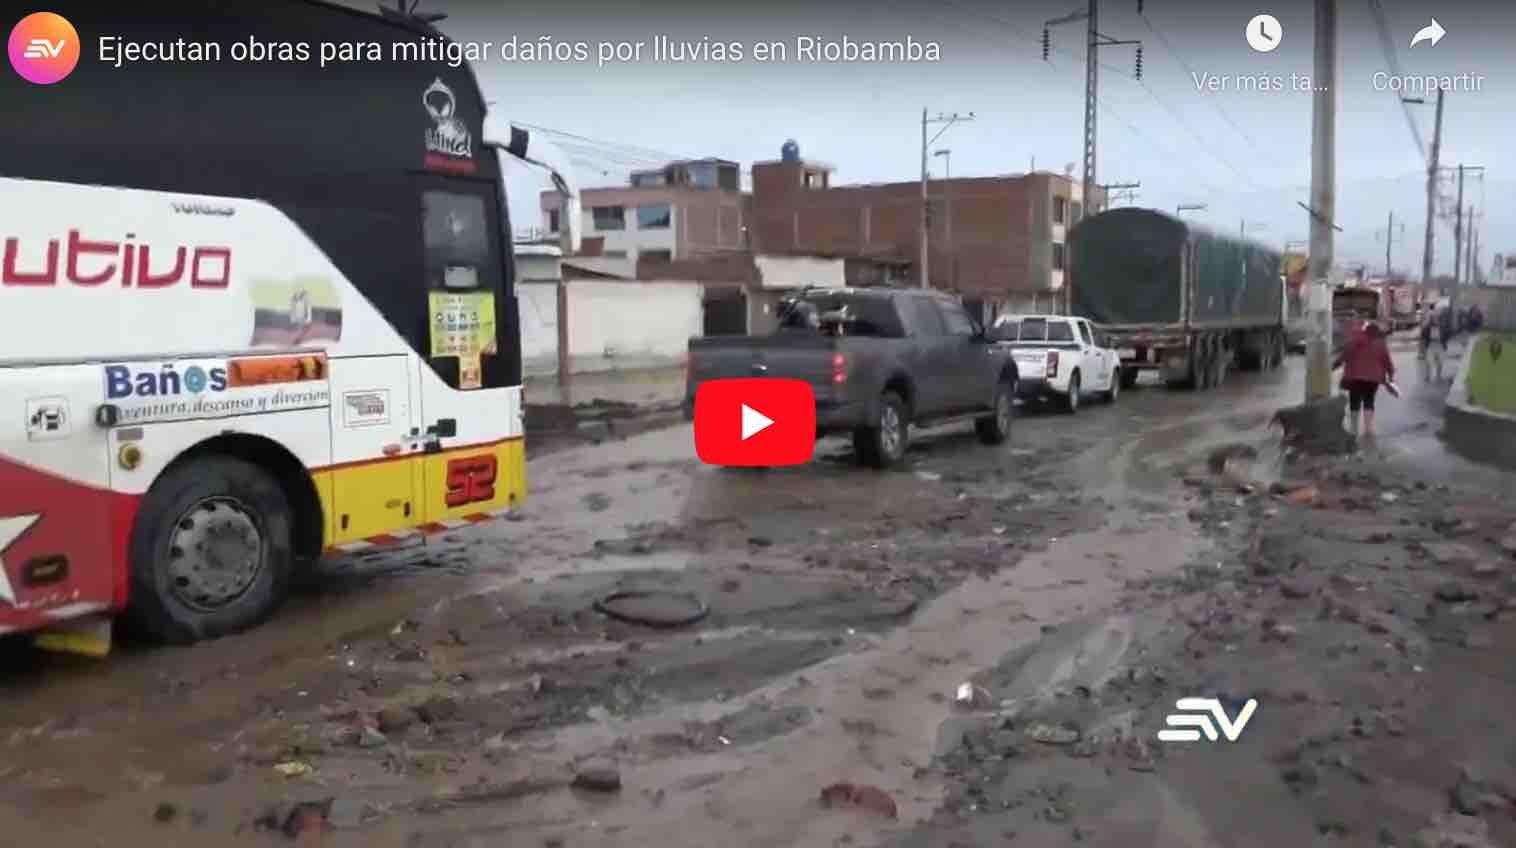 VIDEO: Ejecutan obras para mitigar daños por lluvias en Riobamba